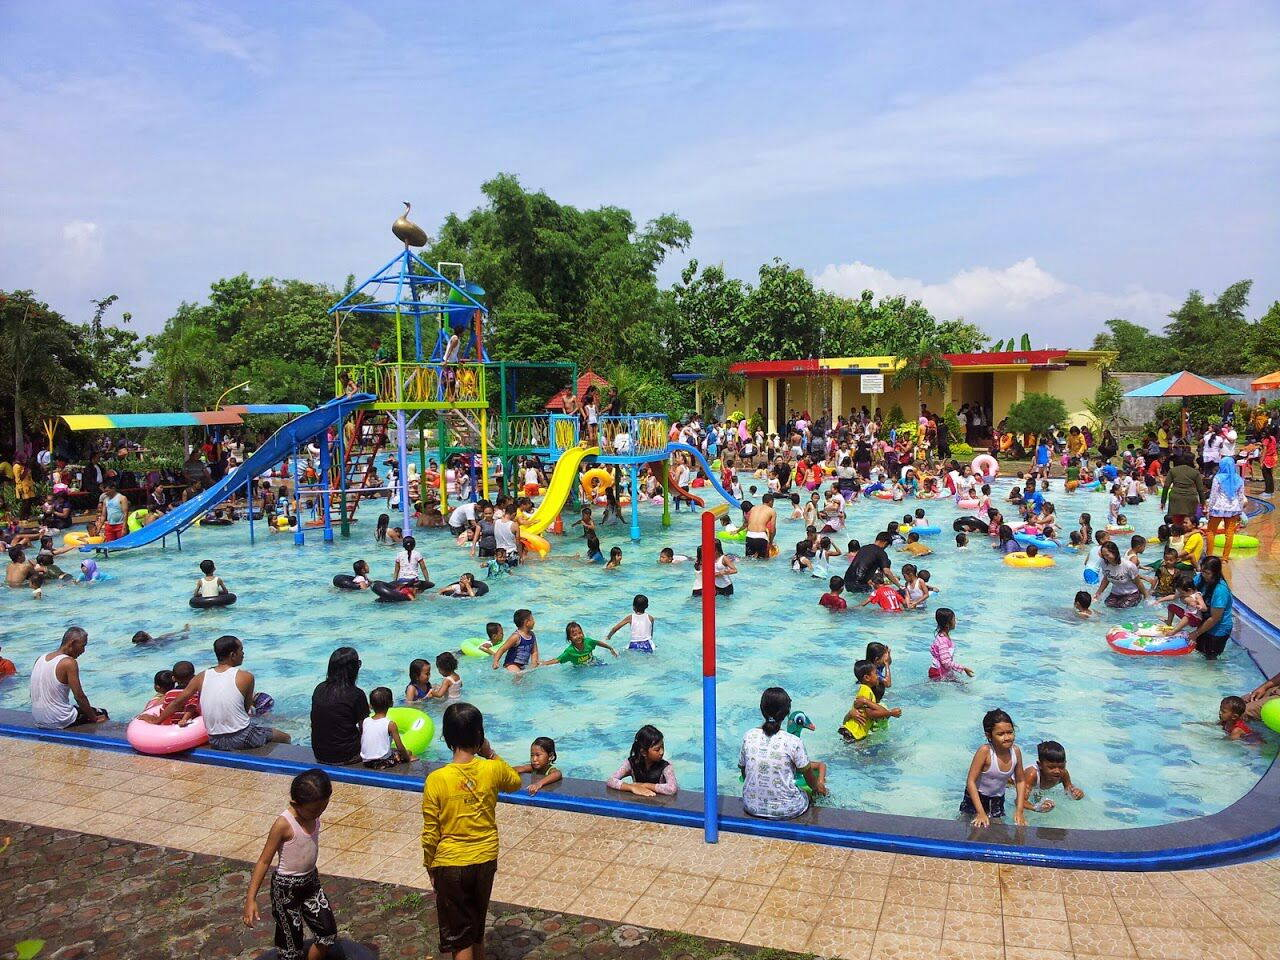 7 Tempat Wisata Air Keluarga Recommended Wisataairbalekambang Blogspot Id Taman